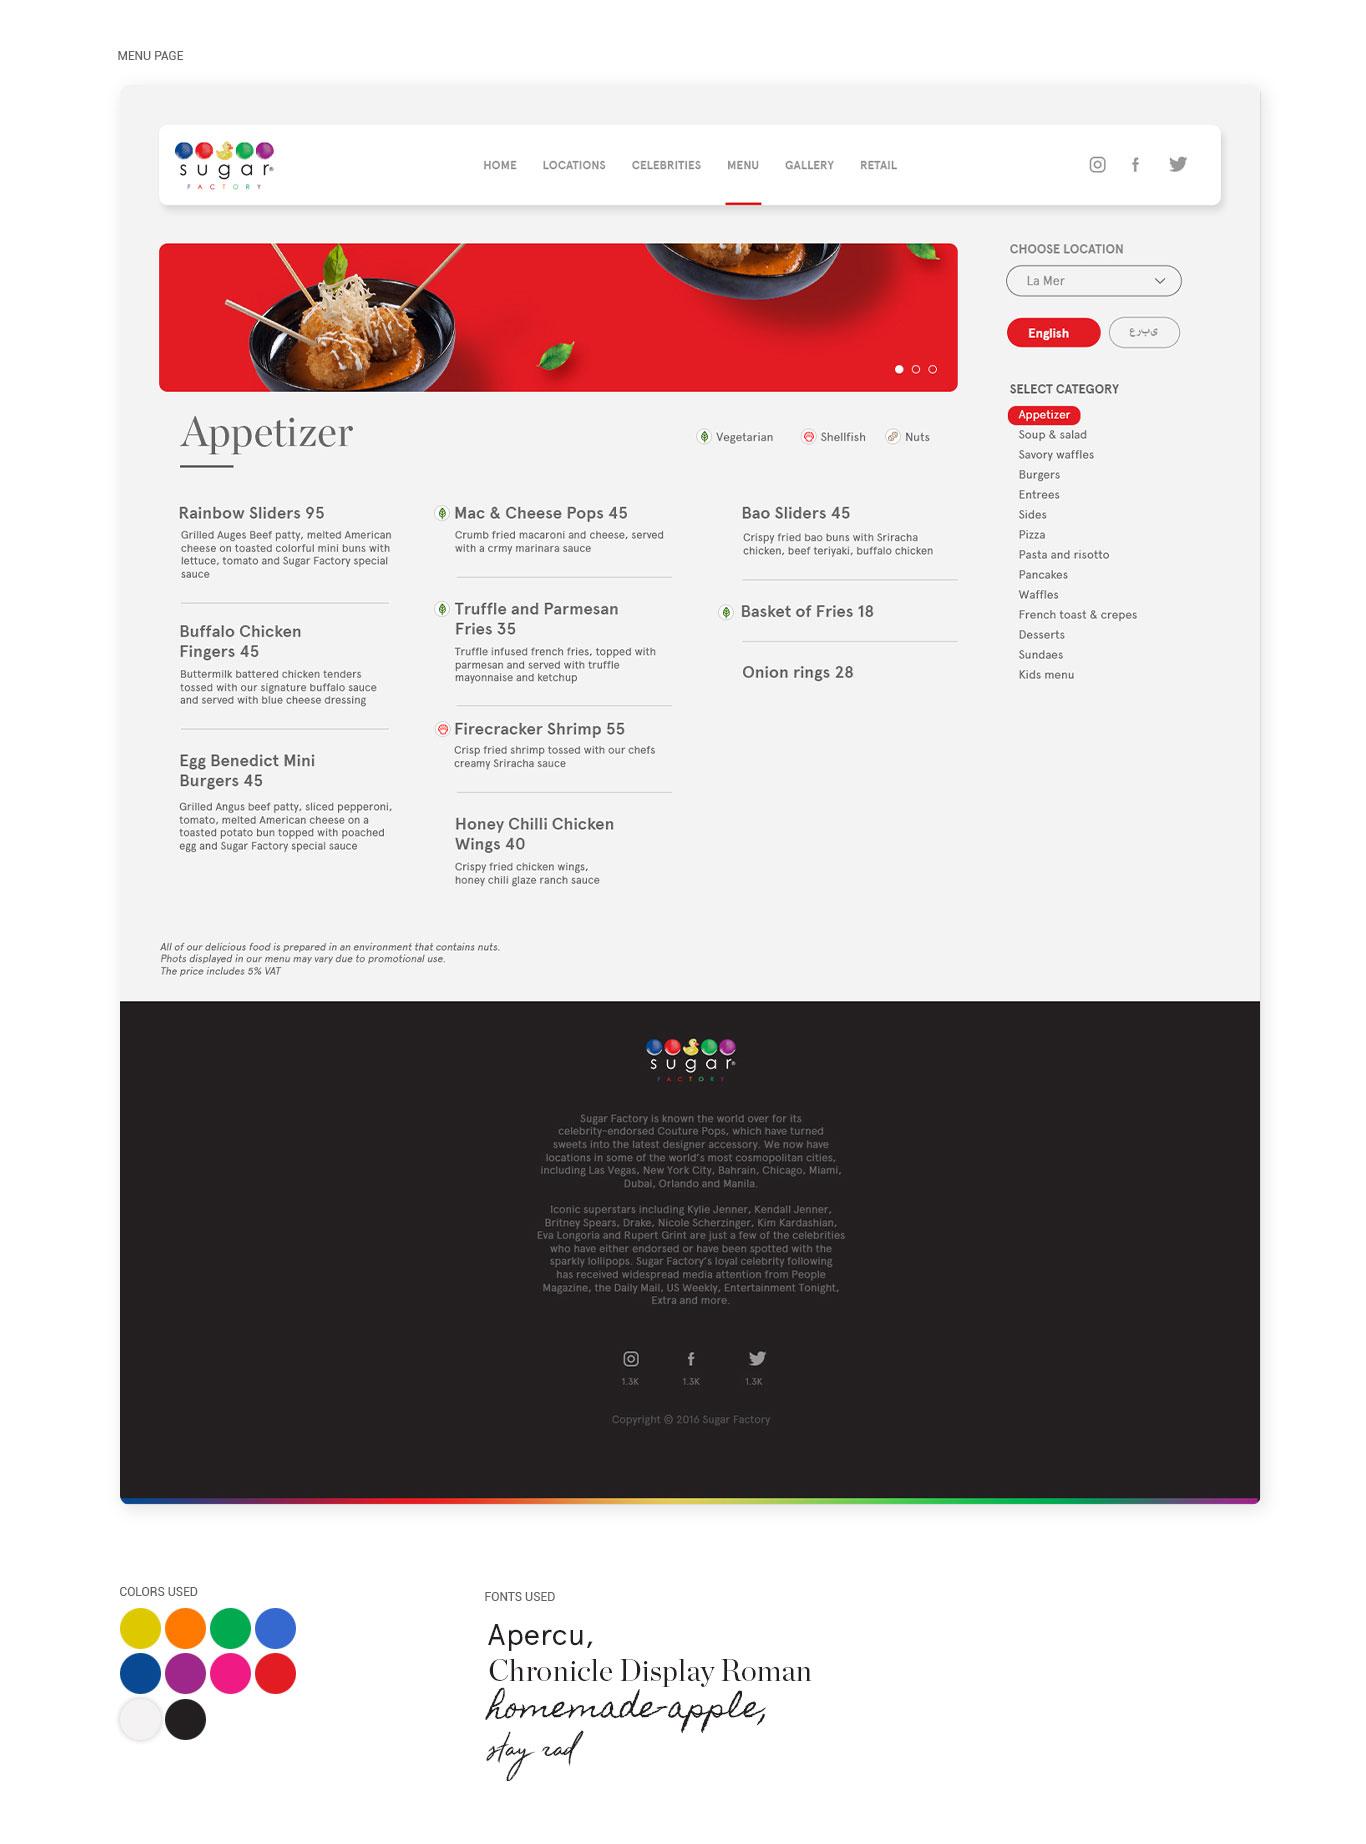 Jucied-Burger-Branding